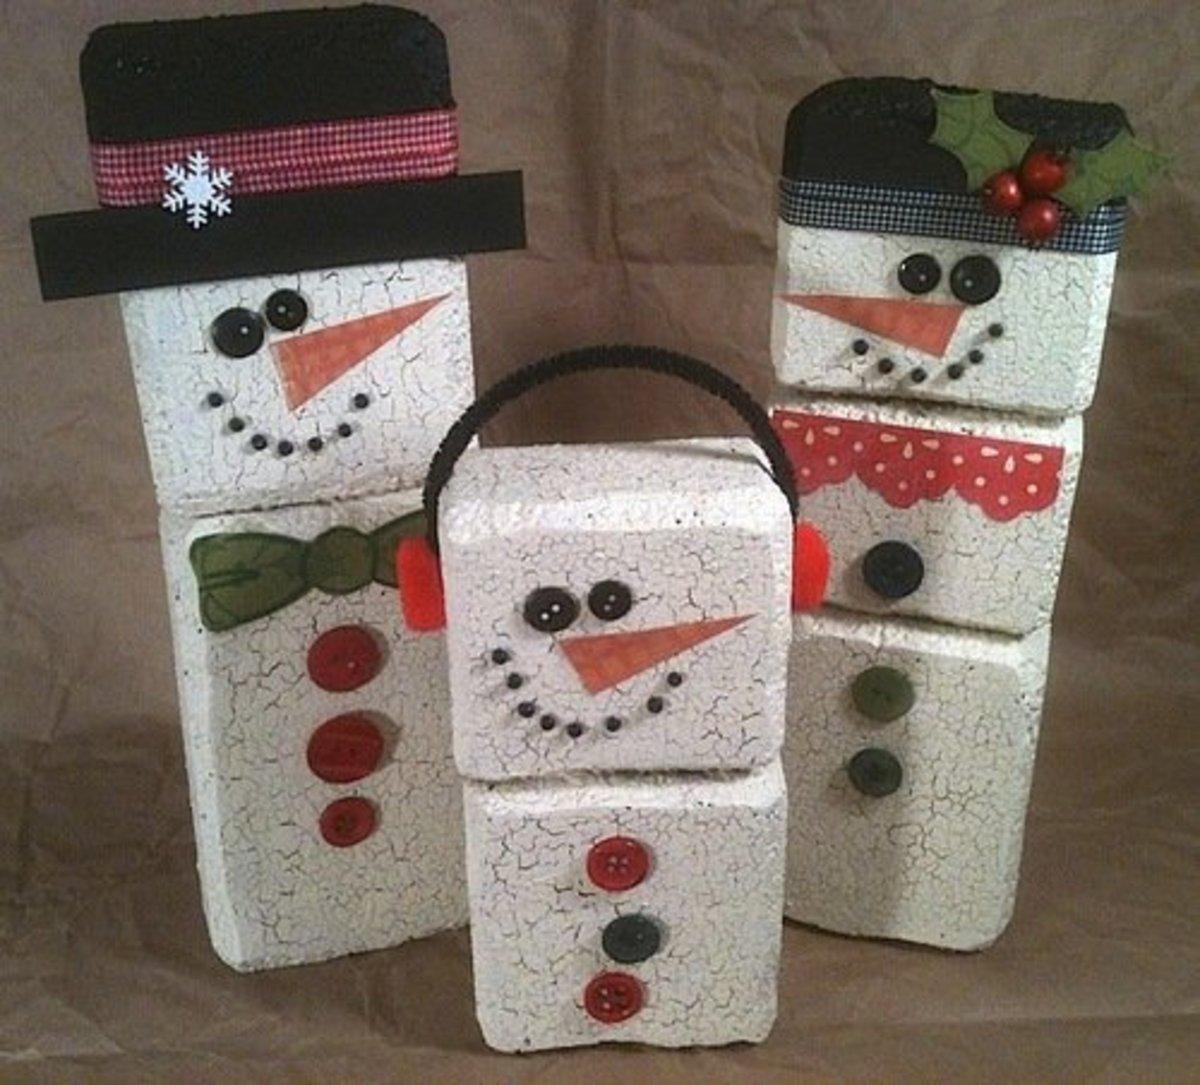 51 Delightful Styrofoam Craft Ideas